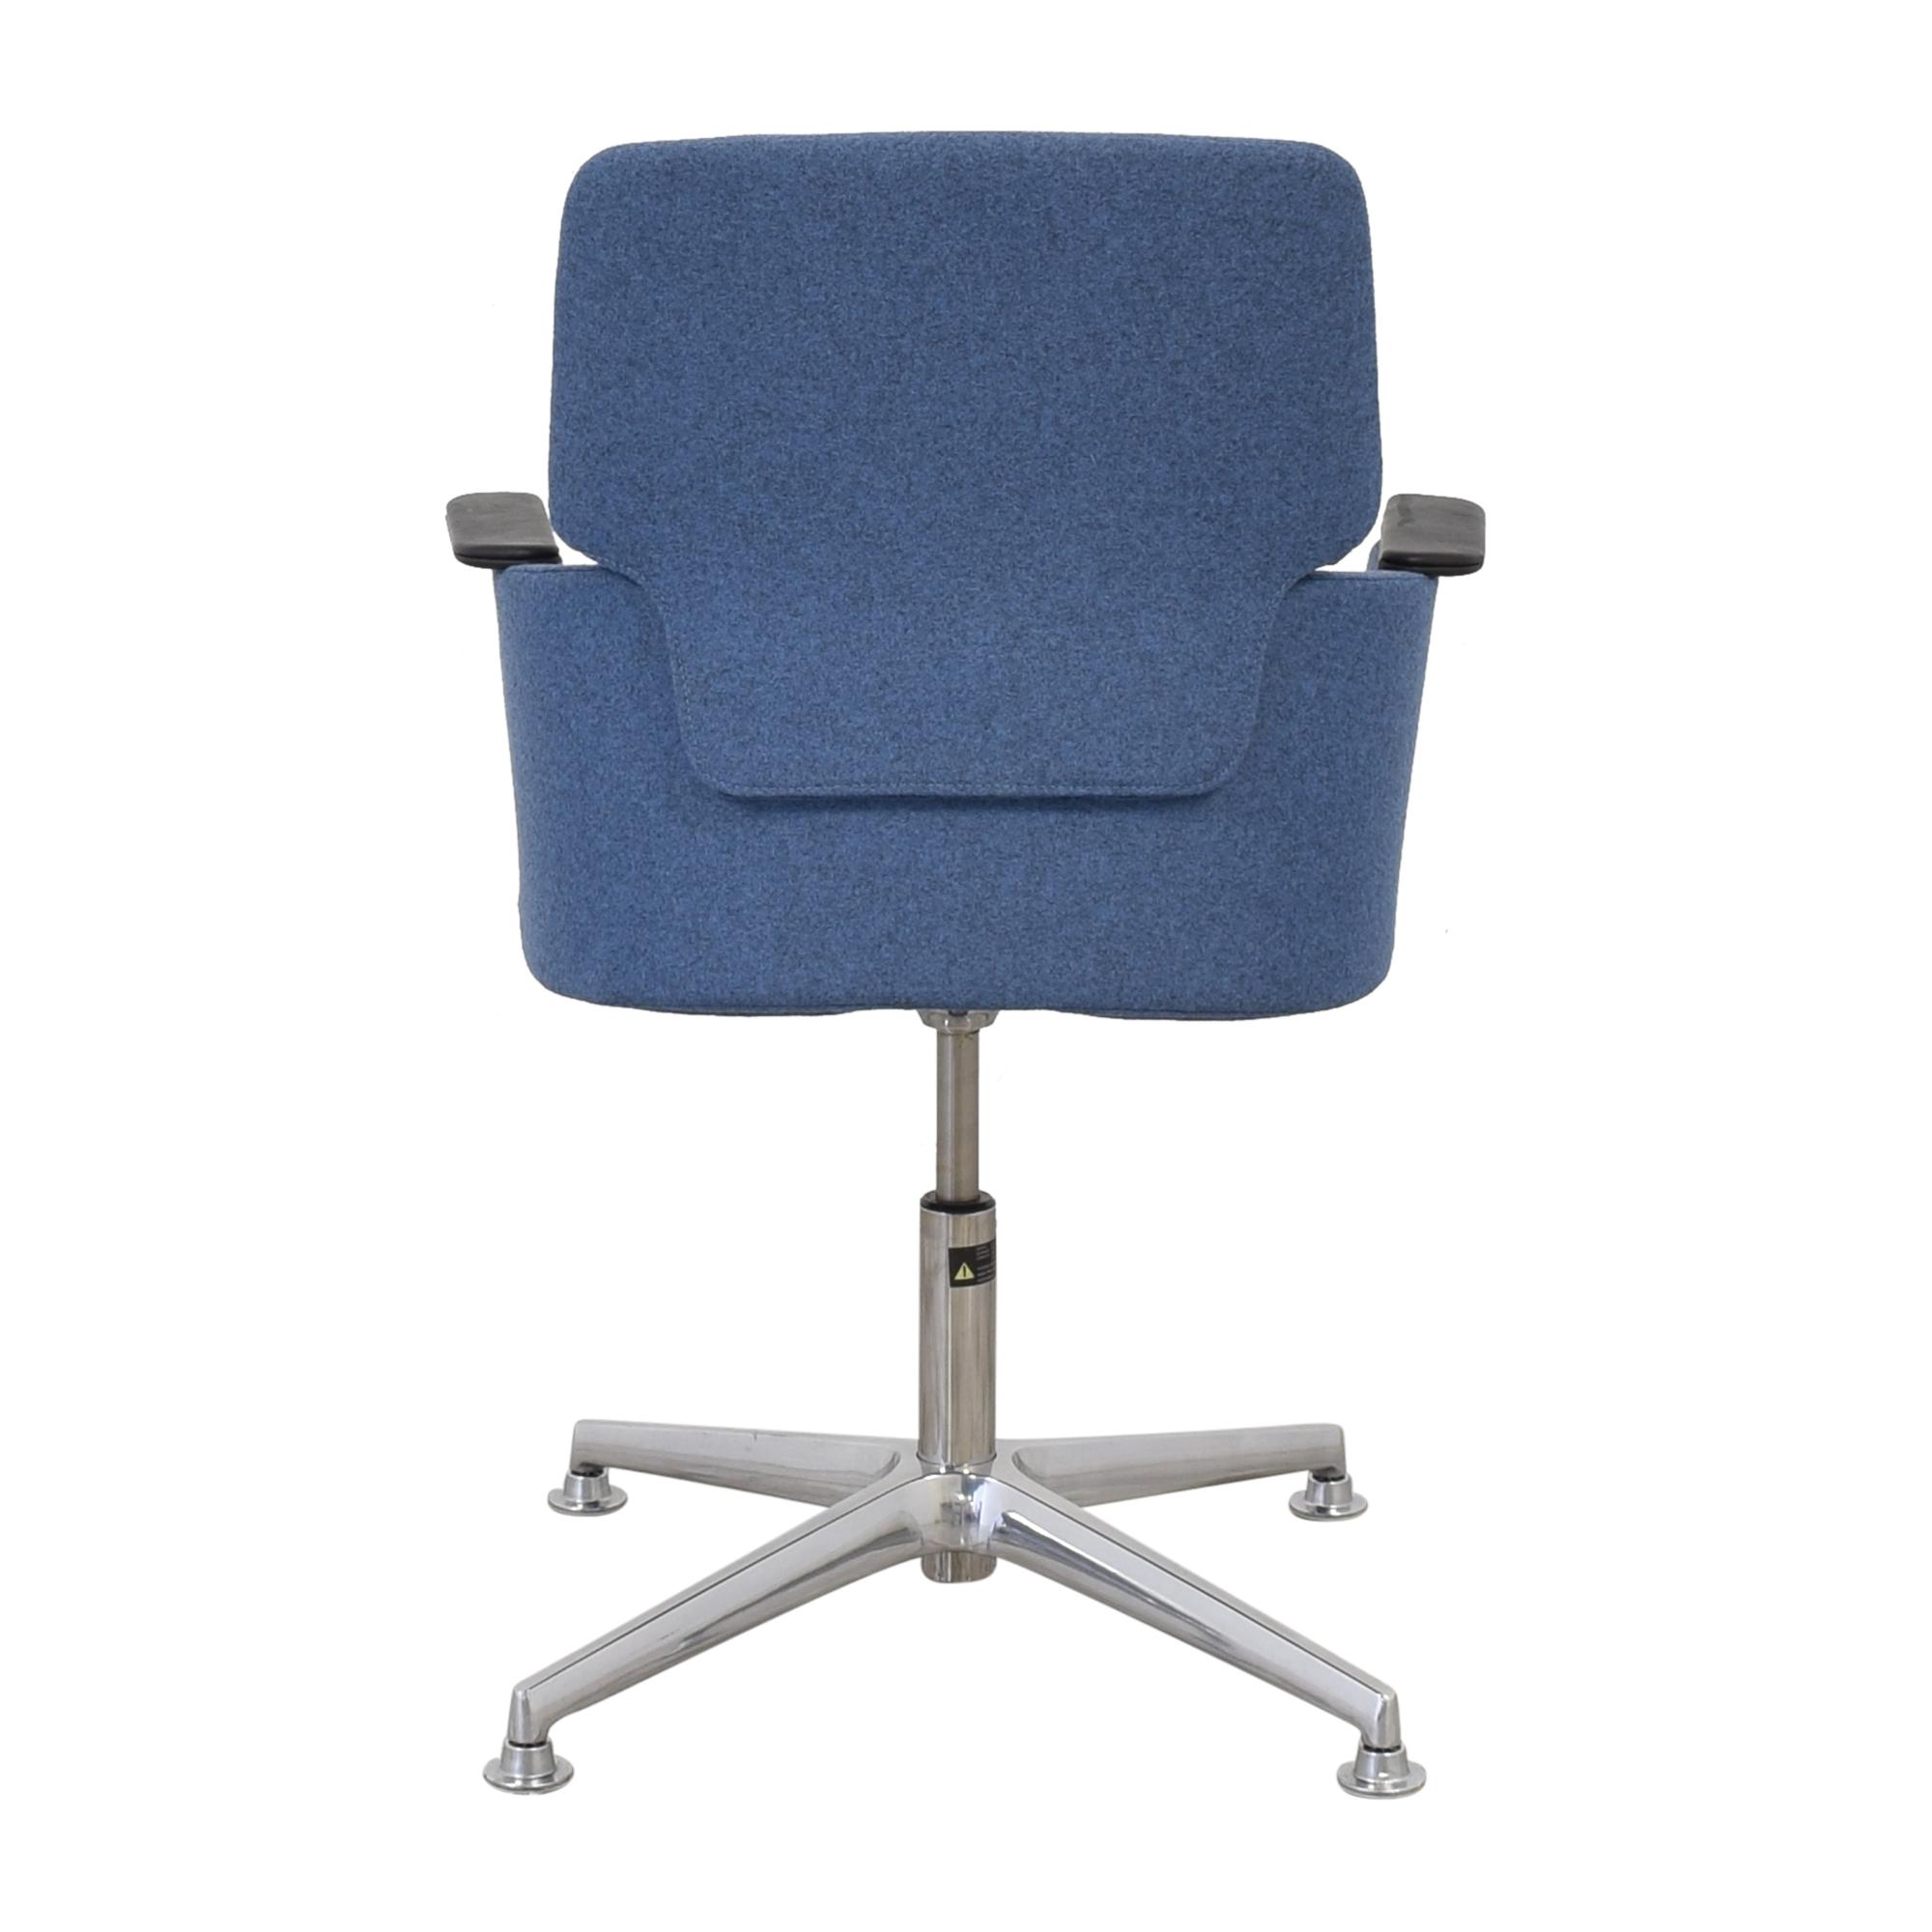 Koleksiyon Tola Visitor Chair / Chairs